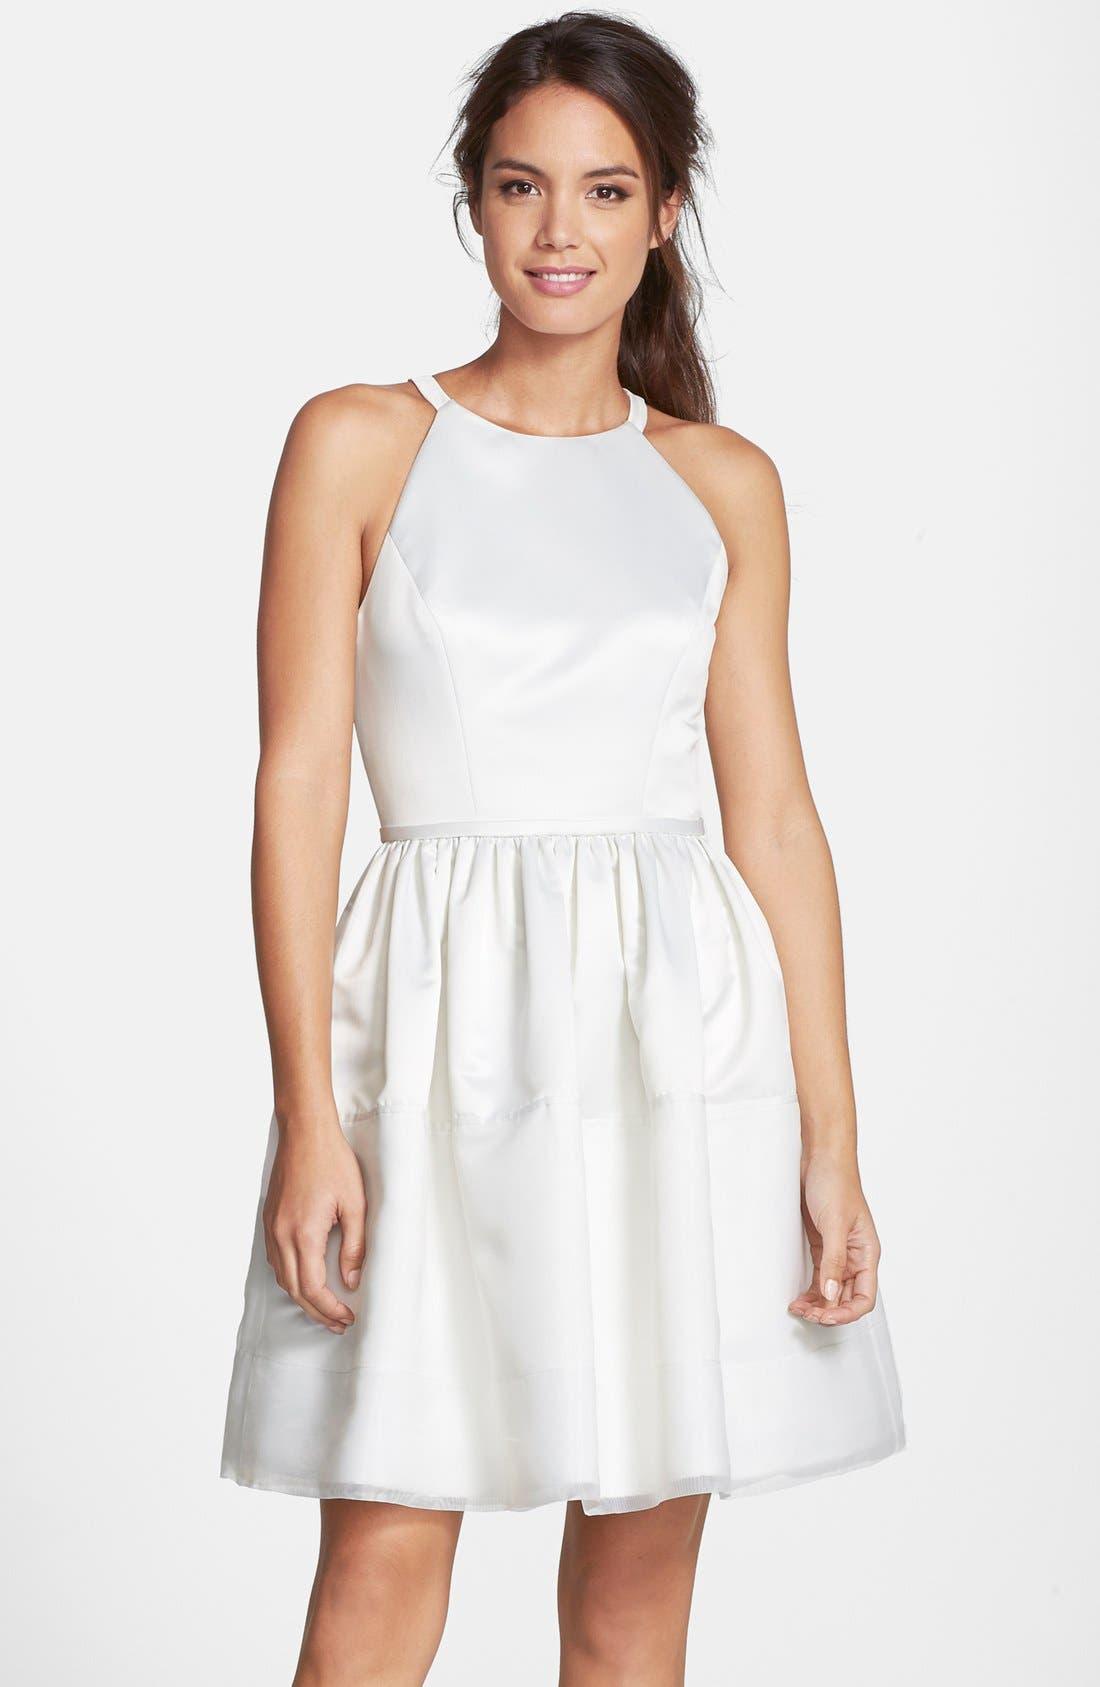 Main Image - ERIN erin fetherston 'Savannah' Satin Fit & Flare Dress